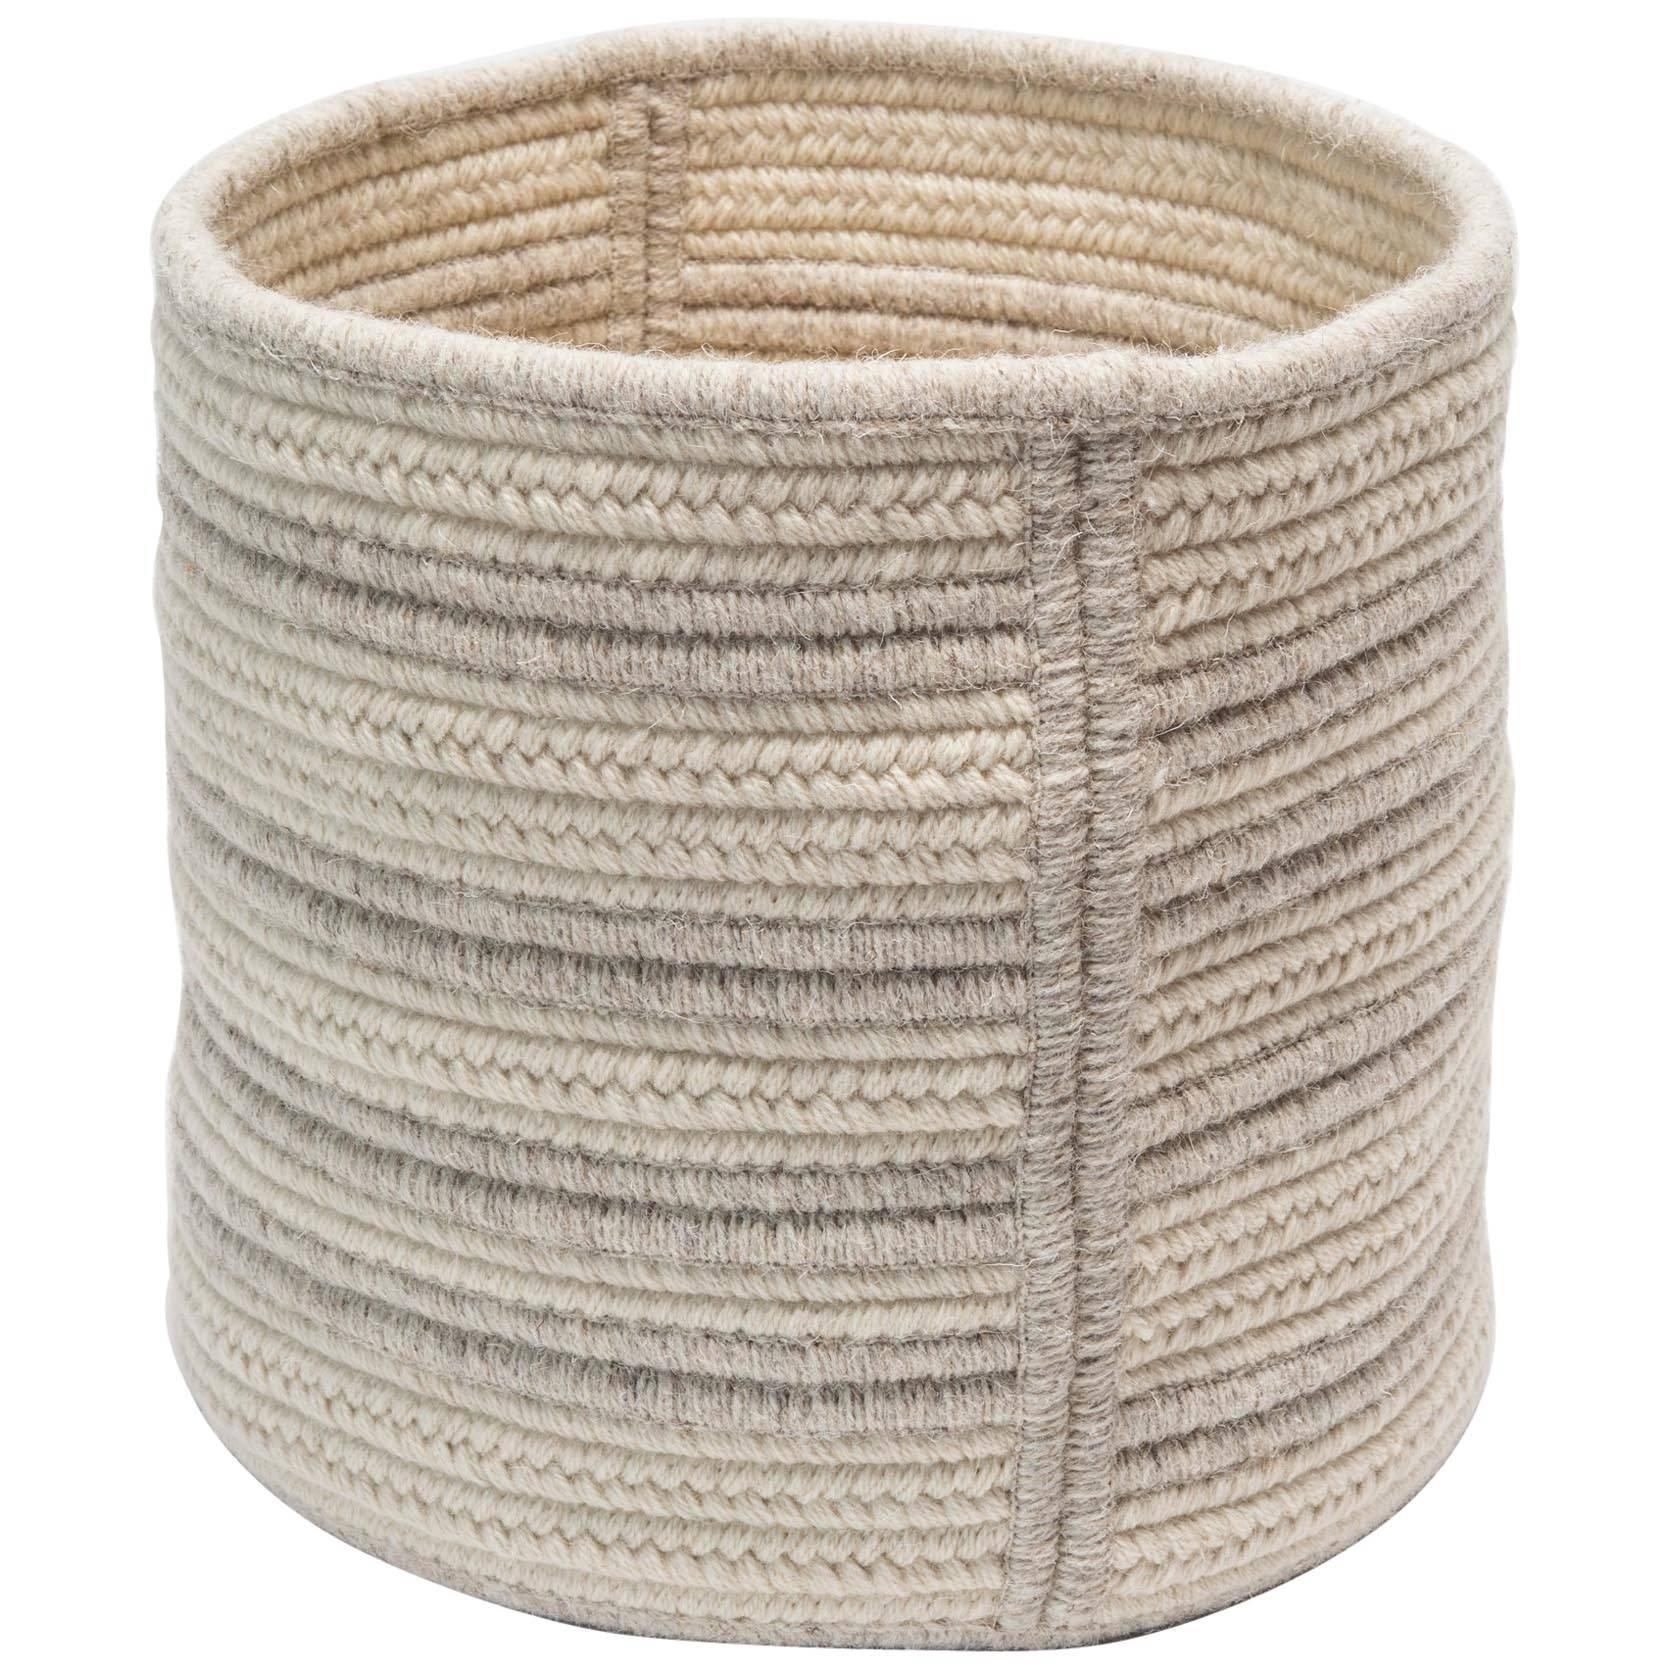 Natural Woven Wool Raised Line Soft Storage Basket in Light Grey Custom made  sc 1 st  1stDibs & Woven Wool Raised Line Soft Storage Basket in Light Grey Custom ...